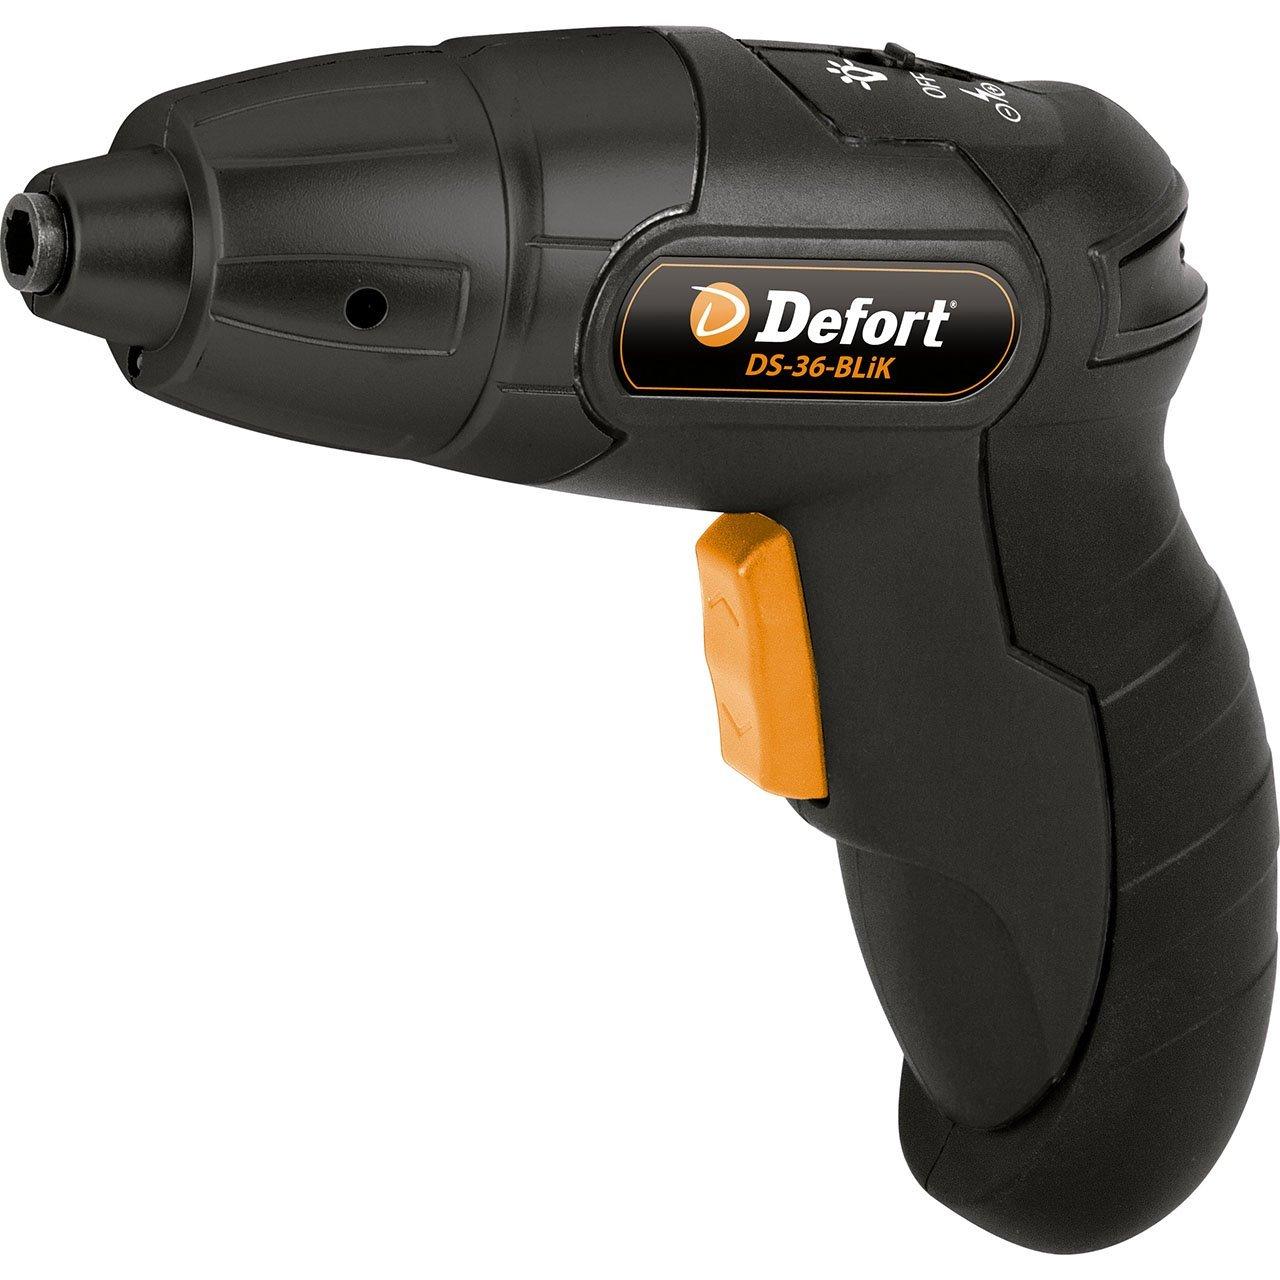 DeFort-DS-36-BLiK-Akkuschrauber-36-V1-Ah-Inkl-100-teilig-Bit-Satz-Bohrerset-Ladegert